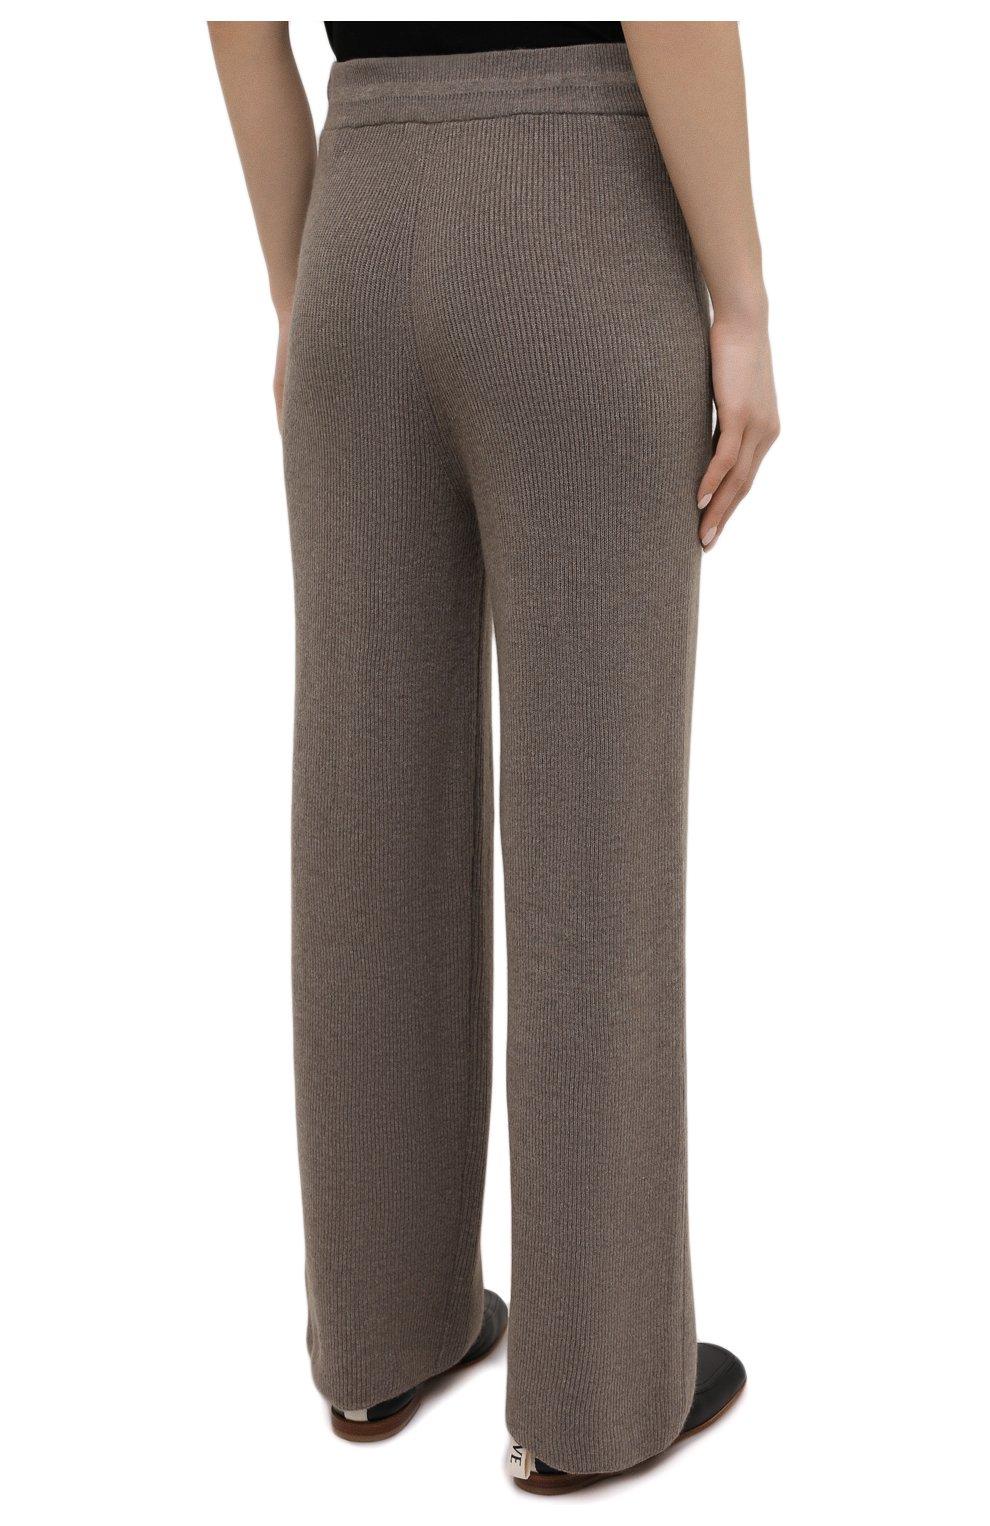 Женские брюки THE FRANKIE SHOP коричневого цвета, арт. PA RKL KR 10 | Фото 4